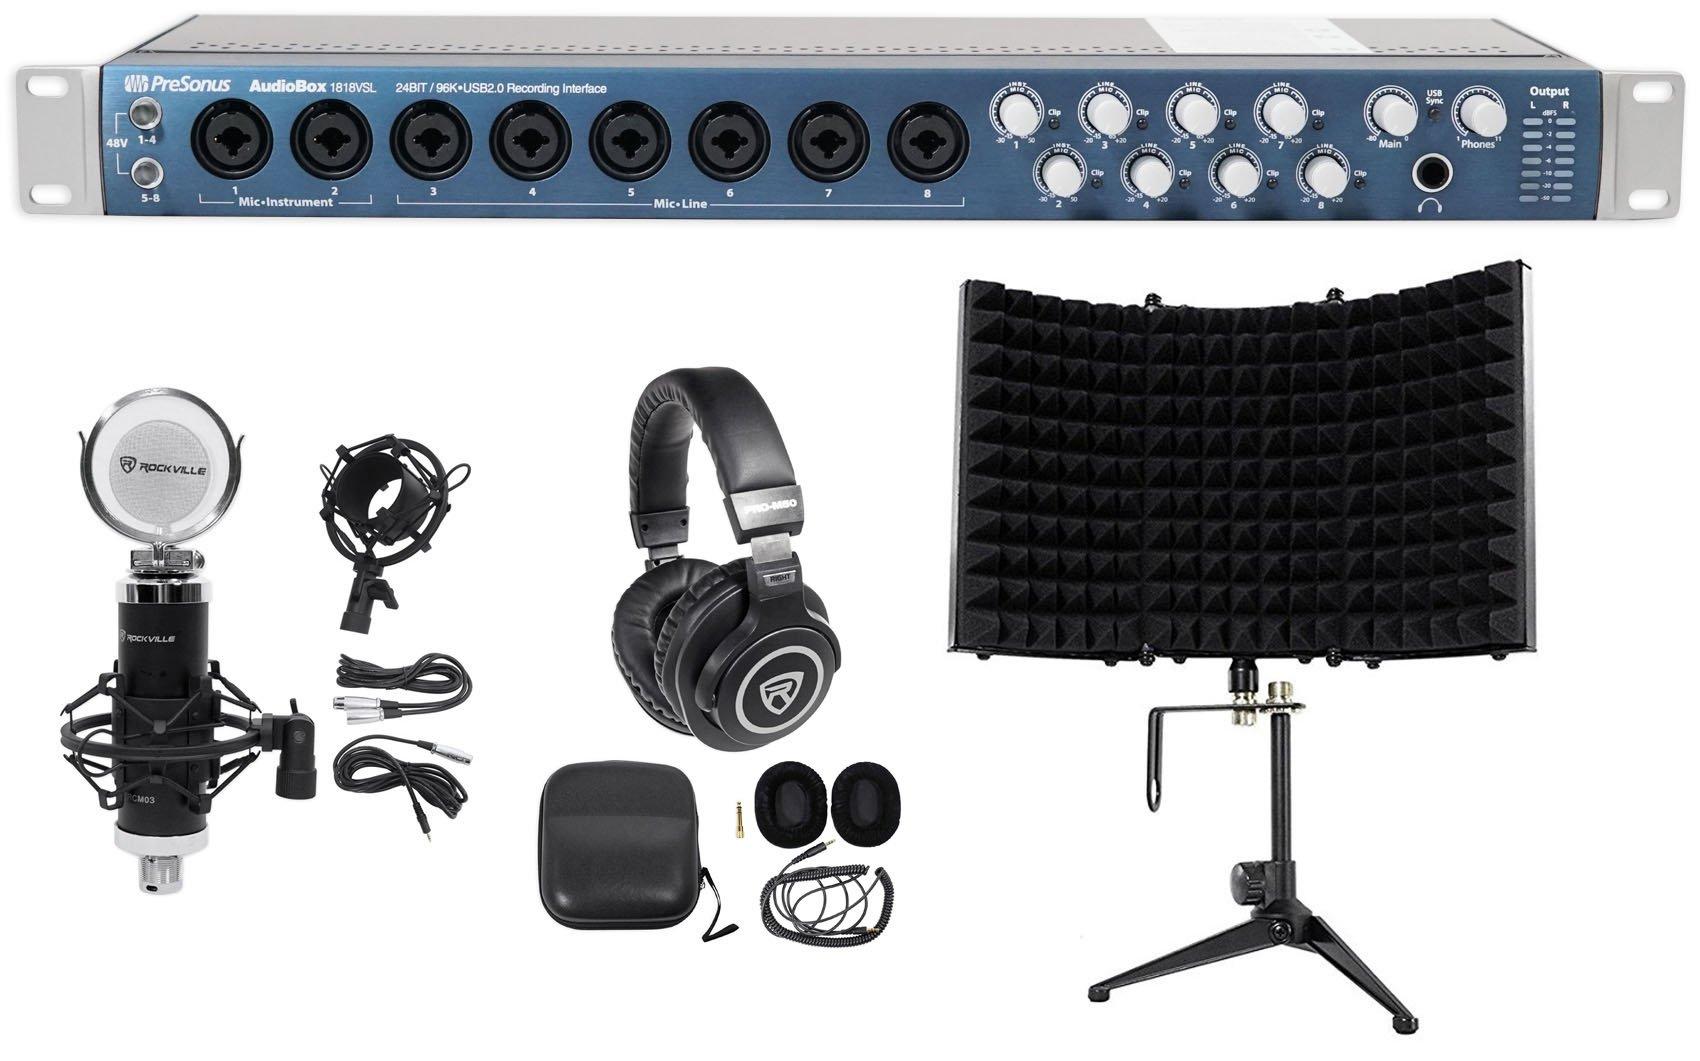 Presonus AUDIOBOX 1818VSL USB MIDI Interface w/Effects+Headphones+Mic+Shield